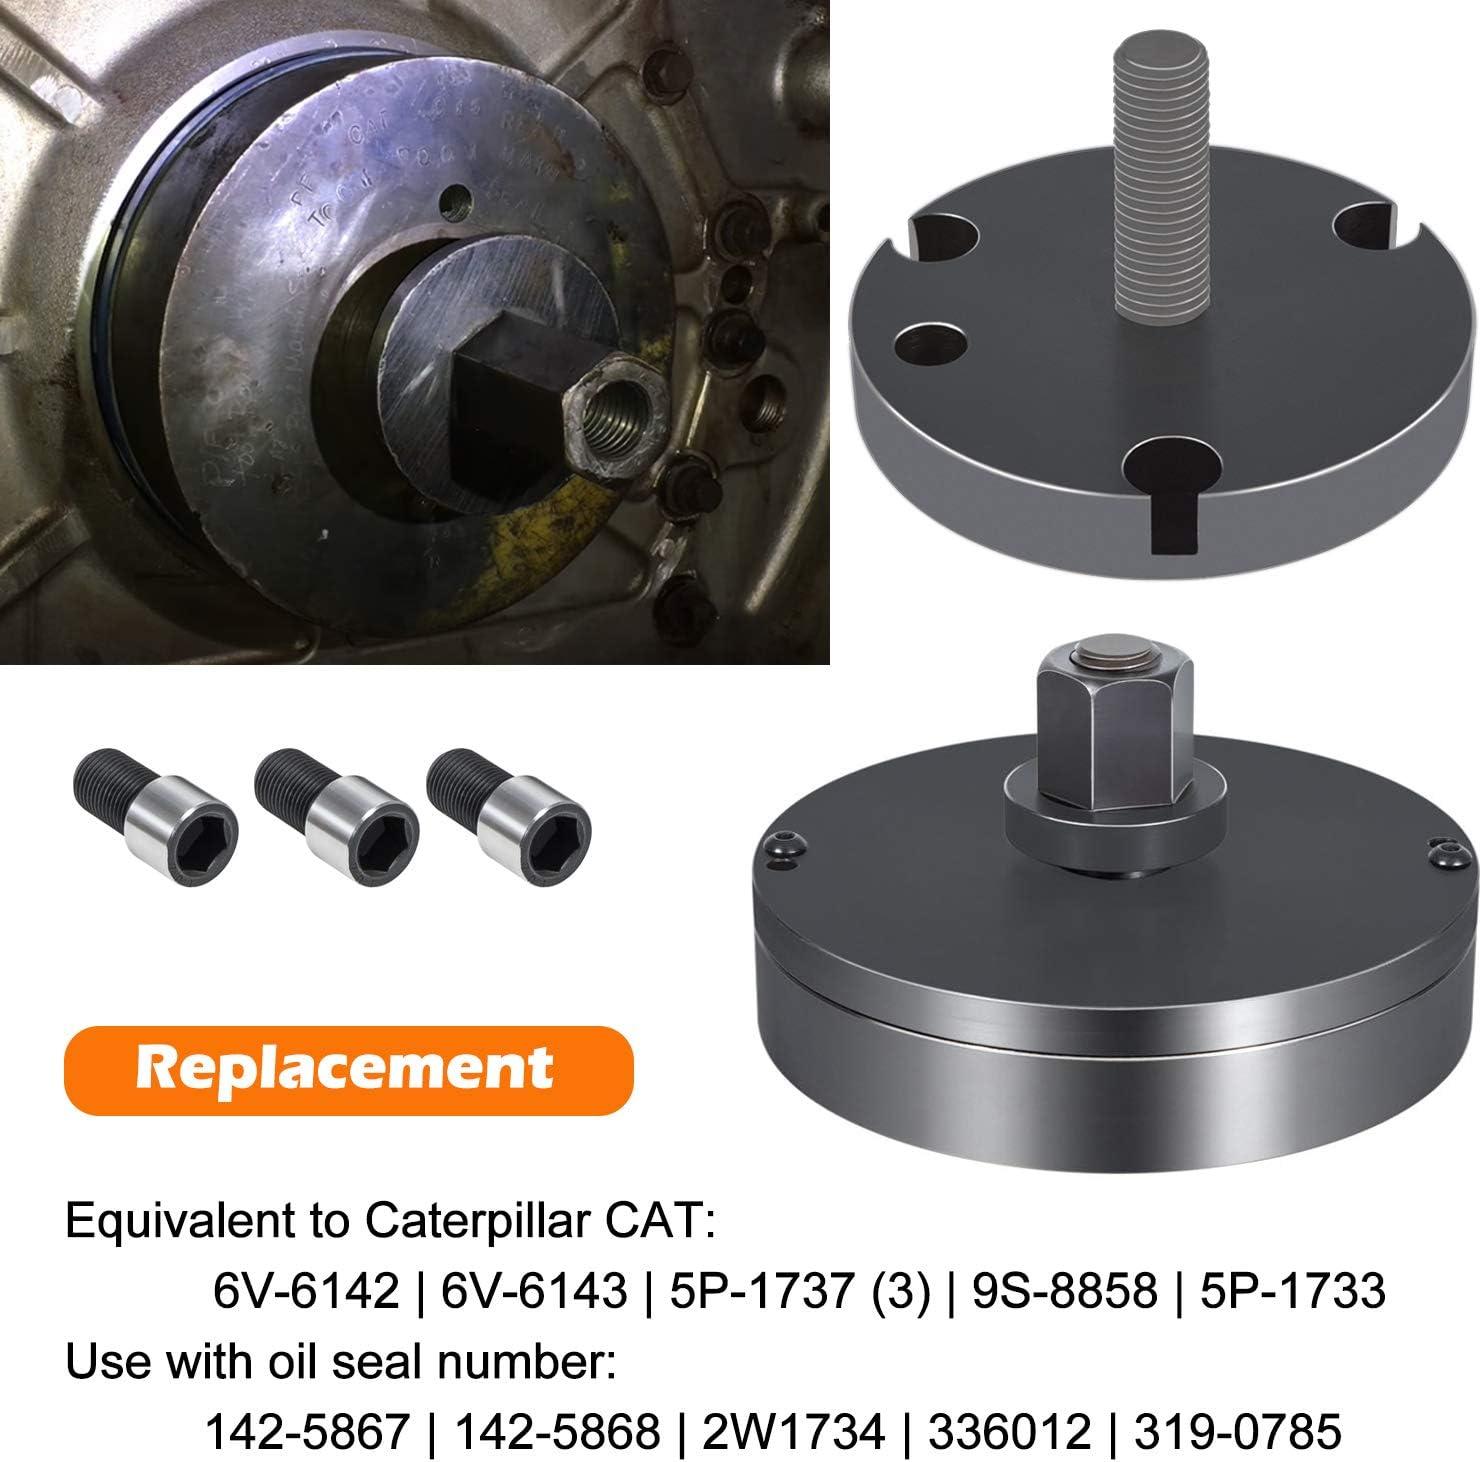 Bonbo 3406 Diesel Front /& Rear Crankshaft Seal Wear Sleeve Installer for CAT Caterpillar 3406 3408 C-15